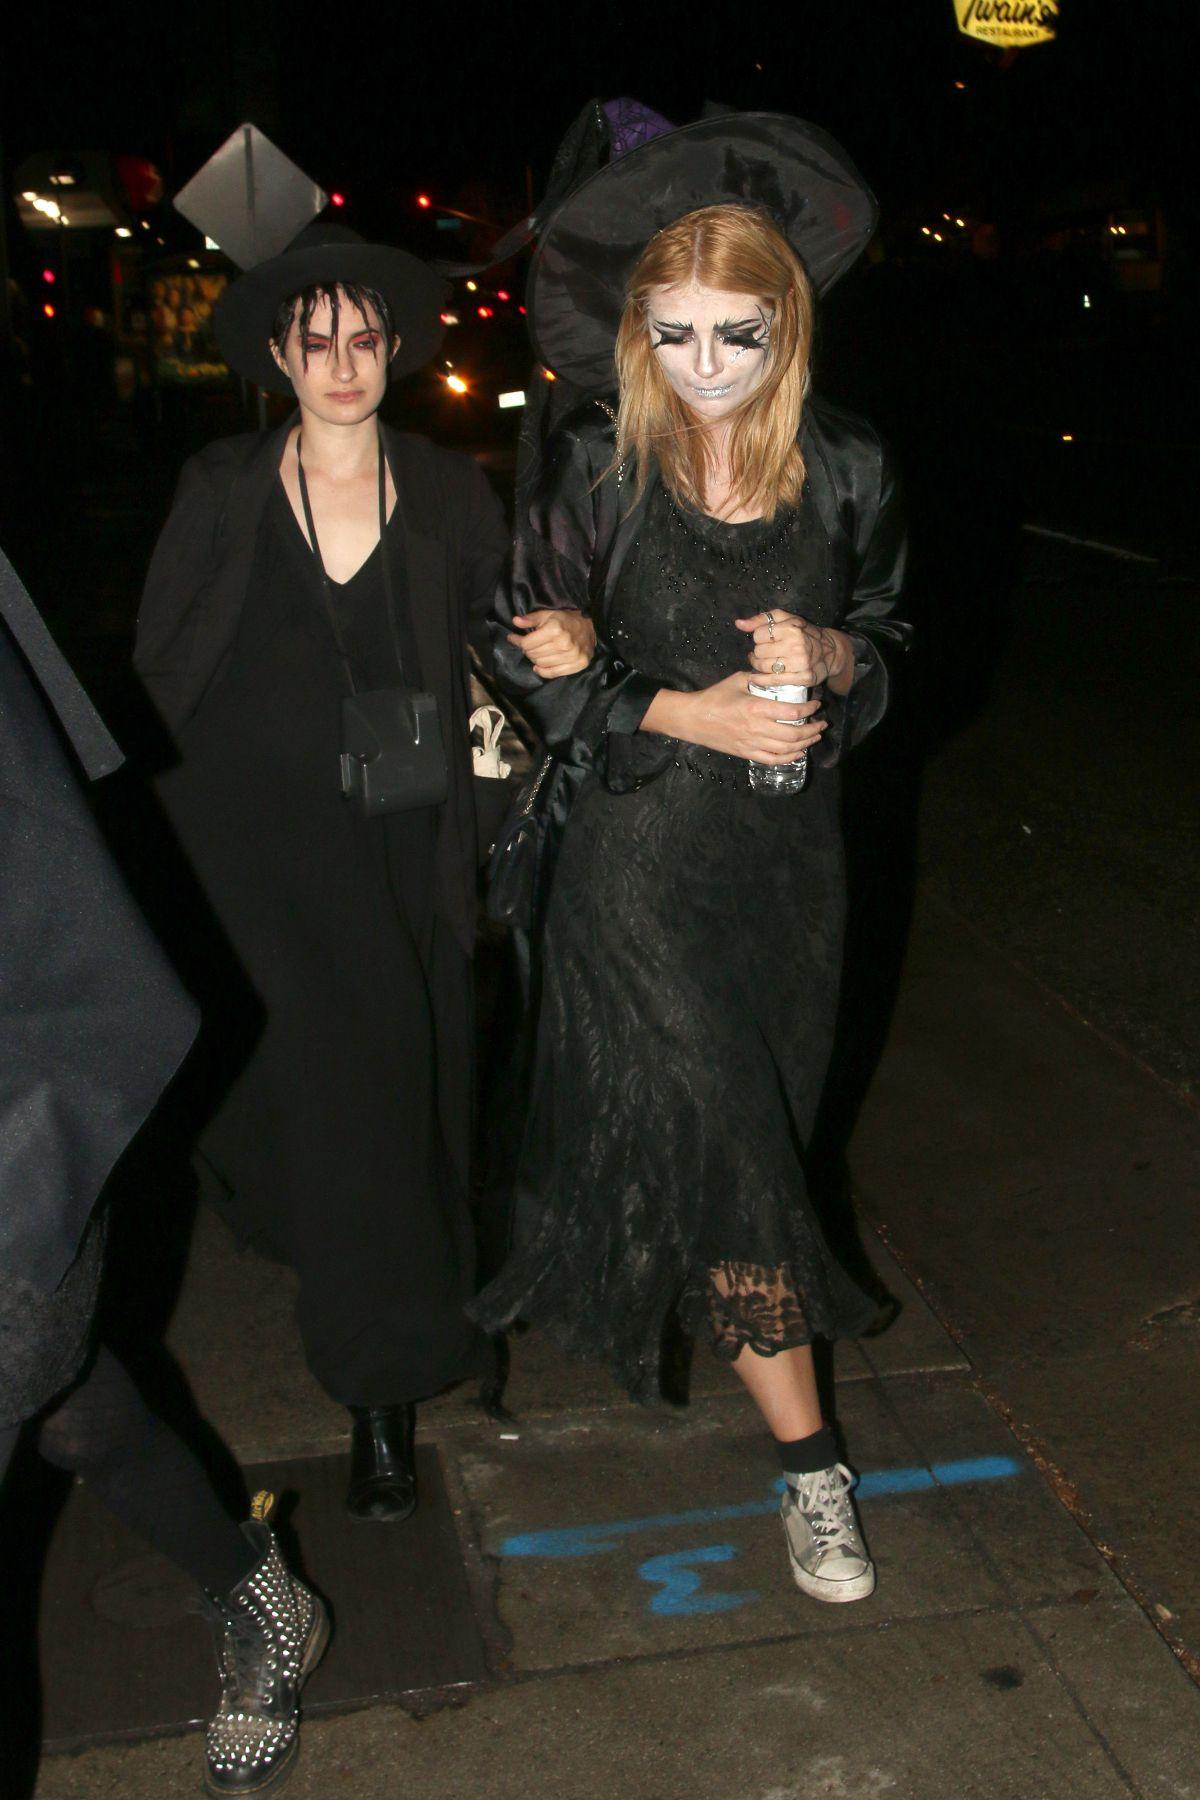 MISCHA BARTON at Adam Levine's Halloween Party in Los Angeles ...